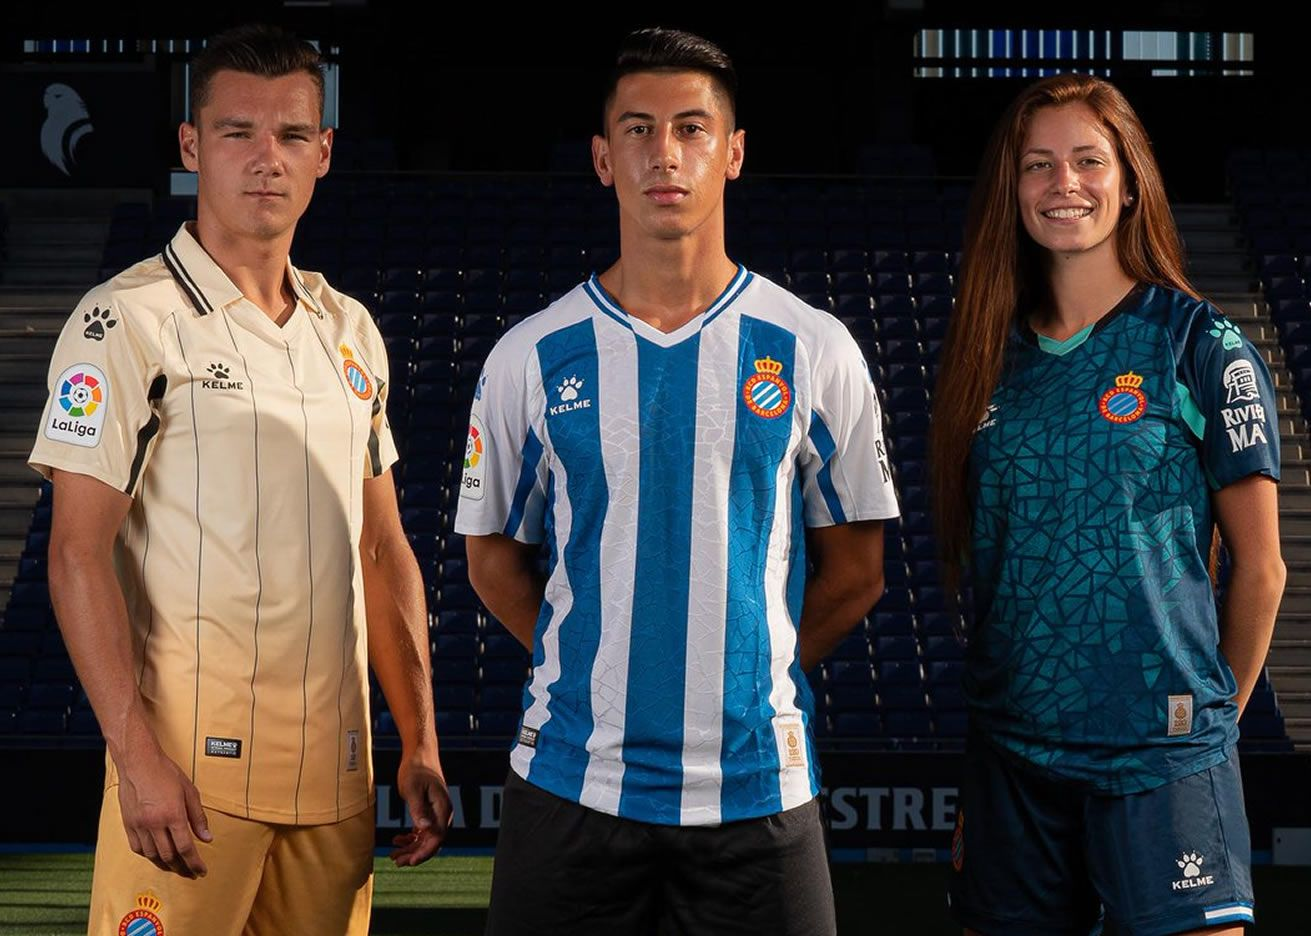 Equipaciones Kelme del RCD Espanyol 2020/21 | Imagen Web Oficial